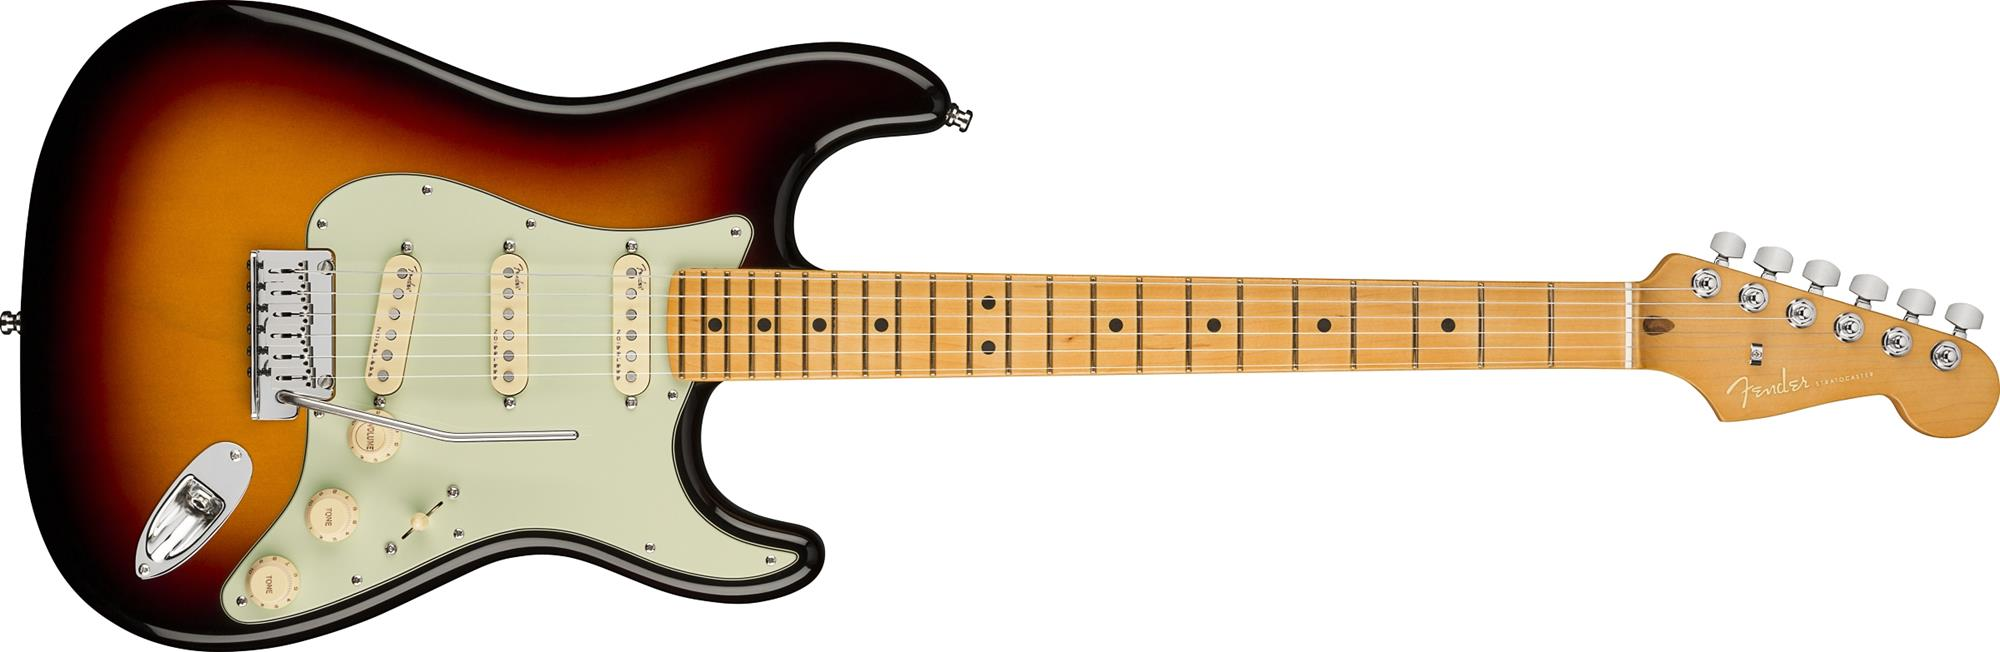 FENDER-American-Ultra-Stratocaster-MN-Ultraburst-0118012712-sku-24447